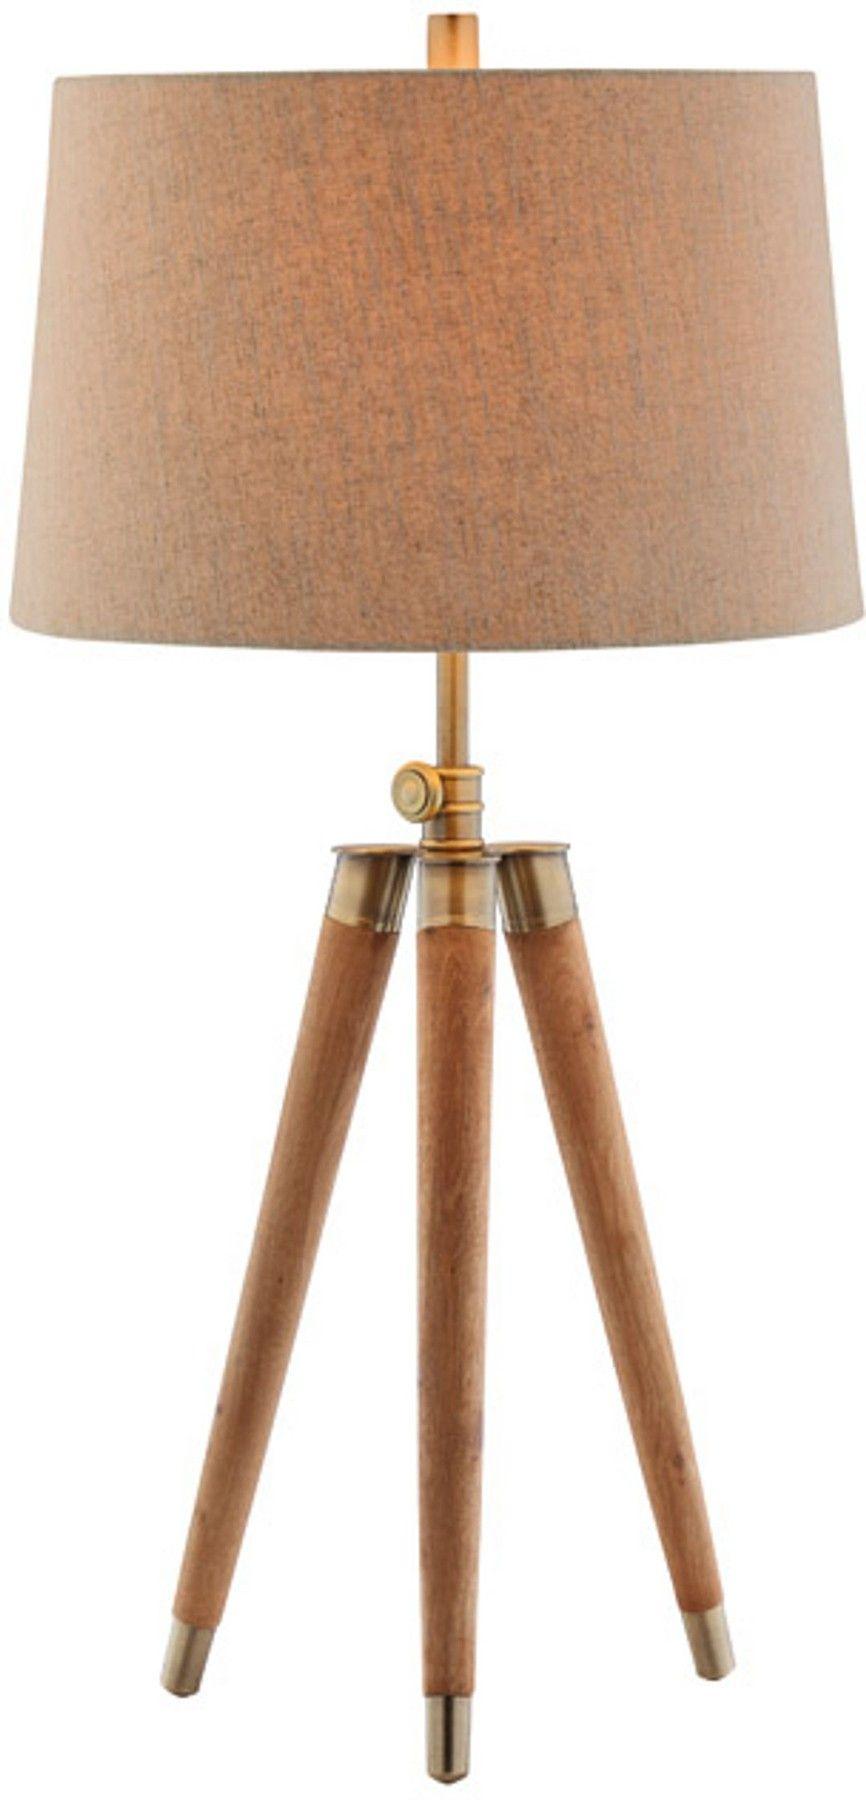 Dreyer Wood Table Lamp. #tripod #lamp #midcentury